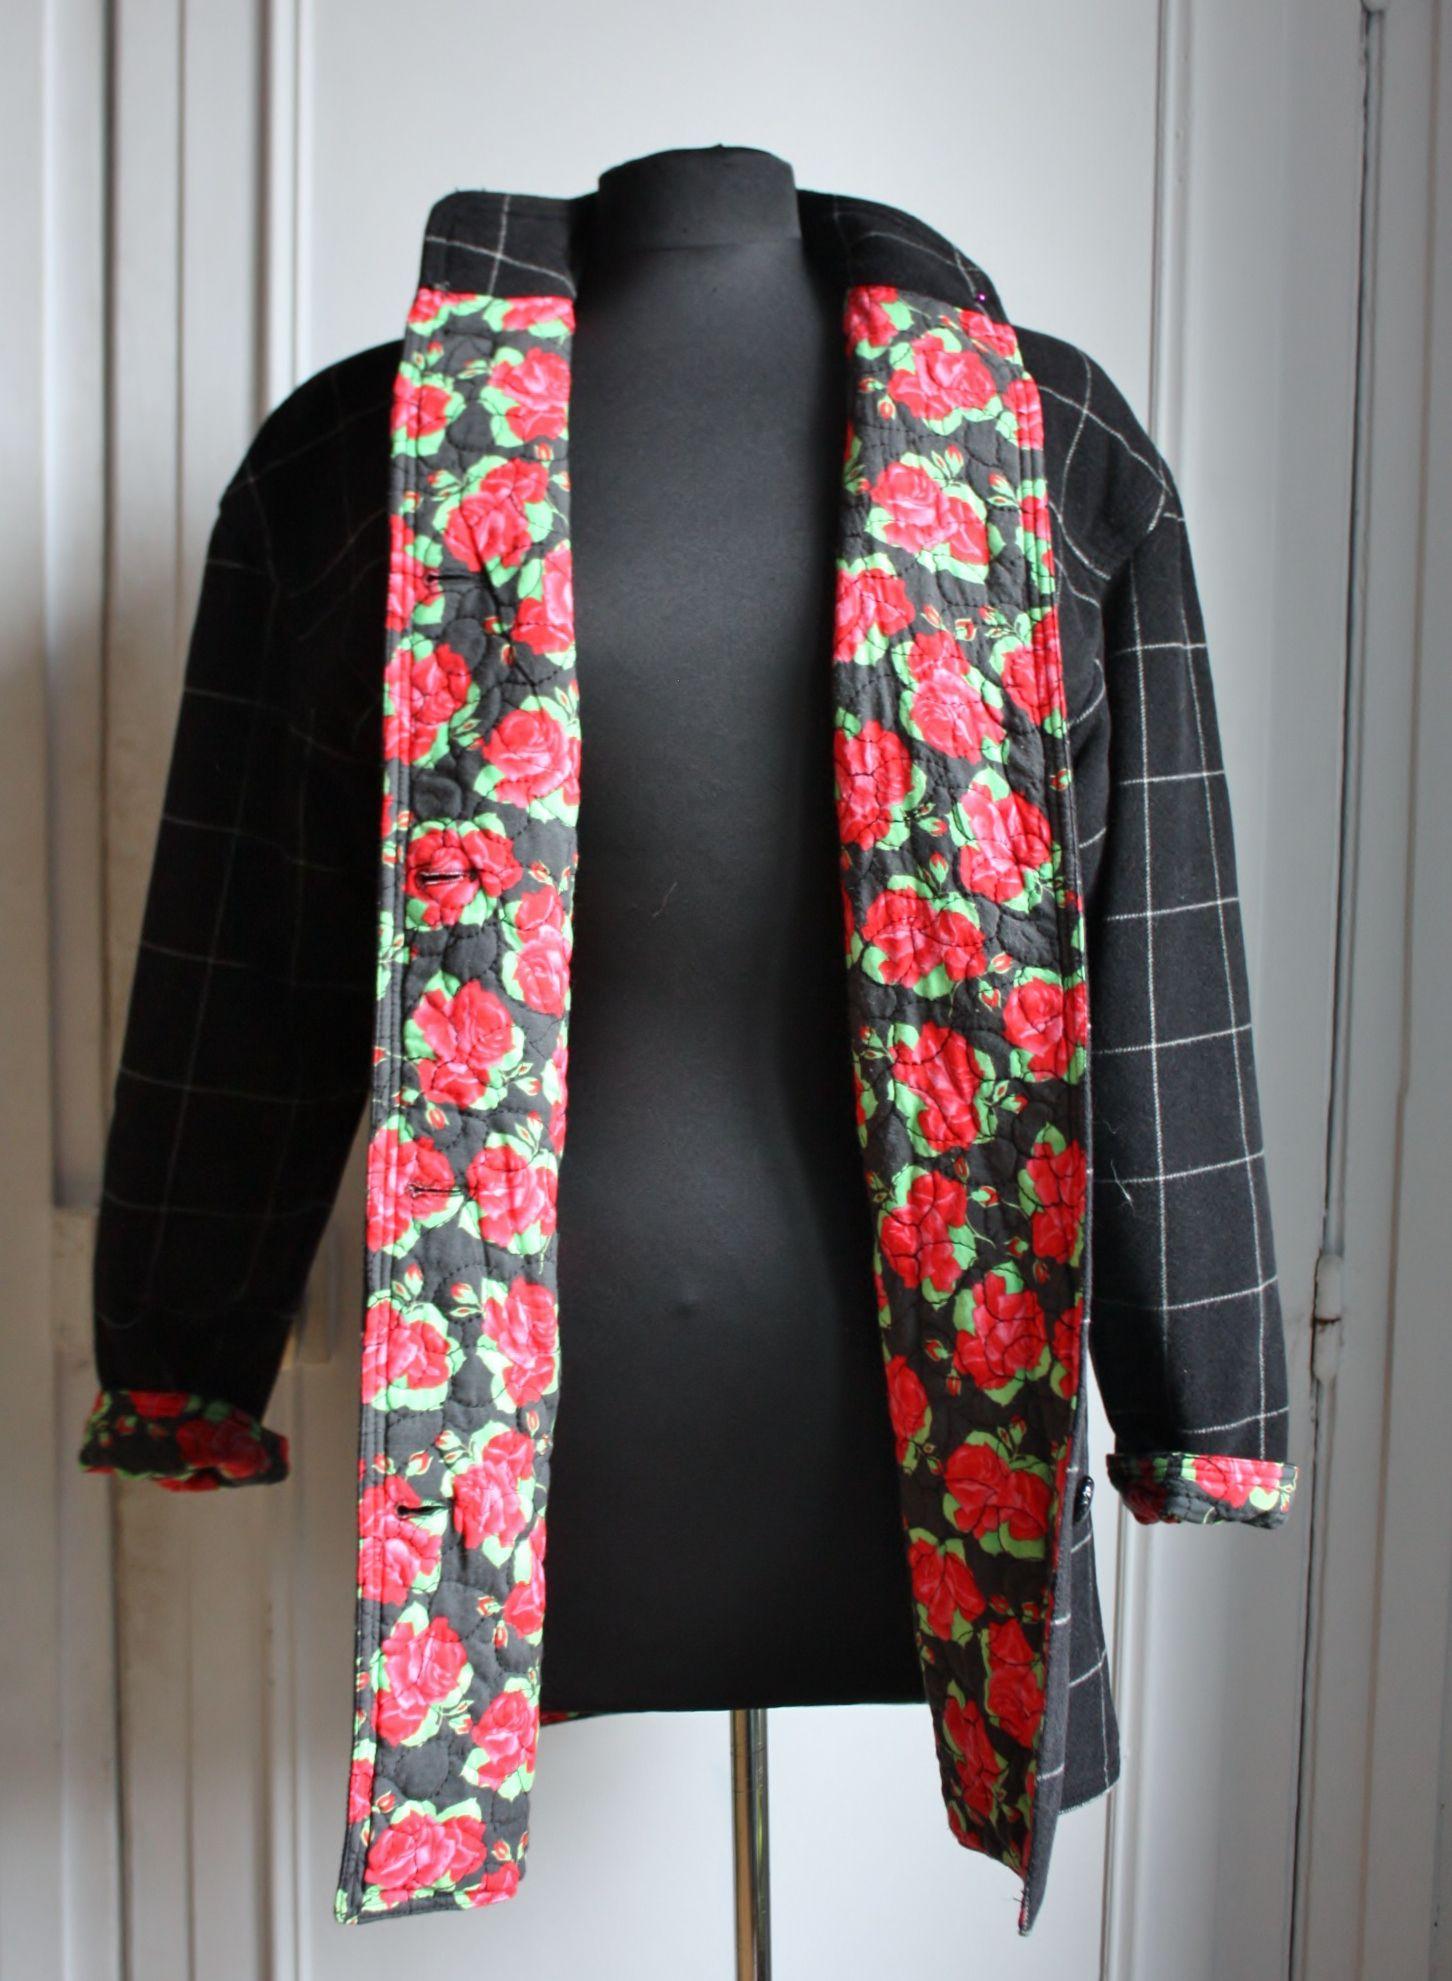 Ungaro winter fleece jacket floral lining le placard blanc